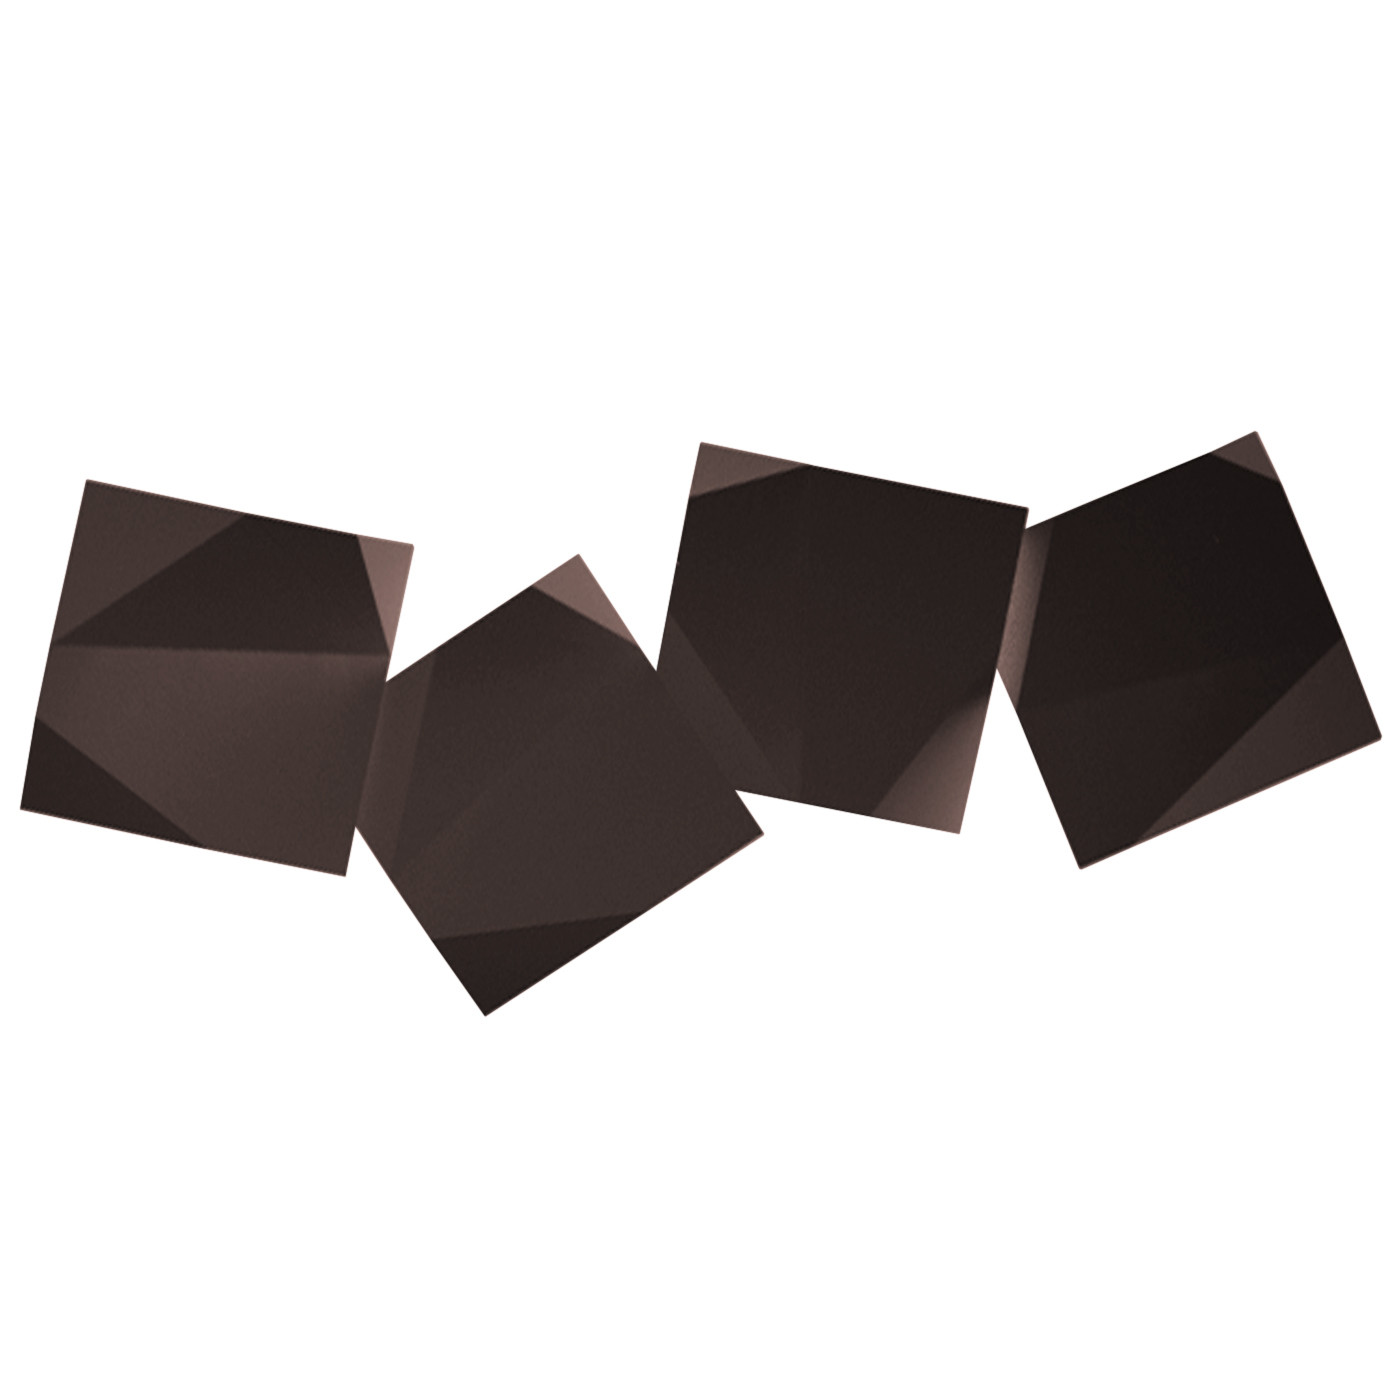 Vibia Origami 4508 Wandleuchte